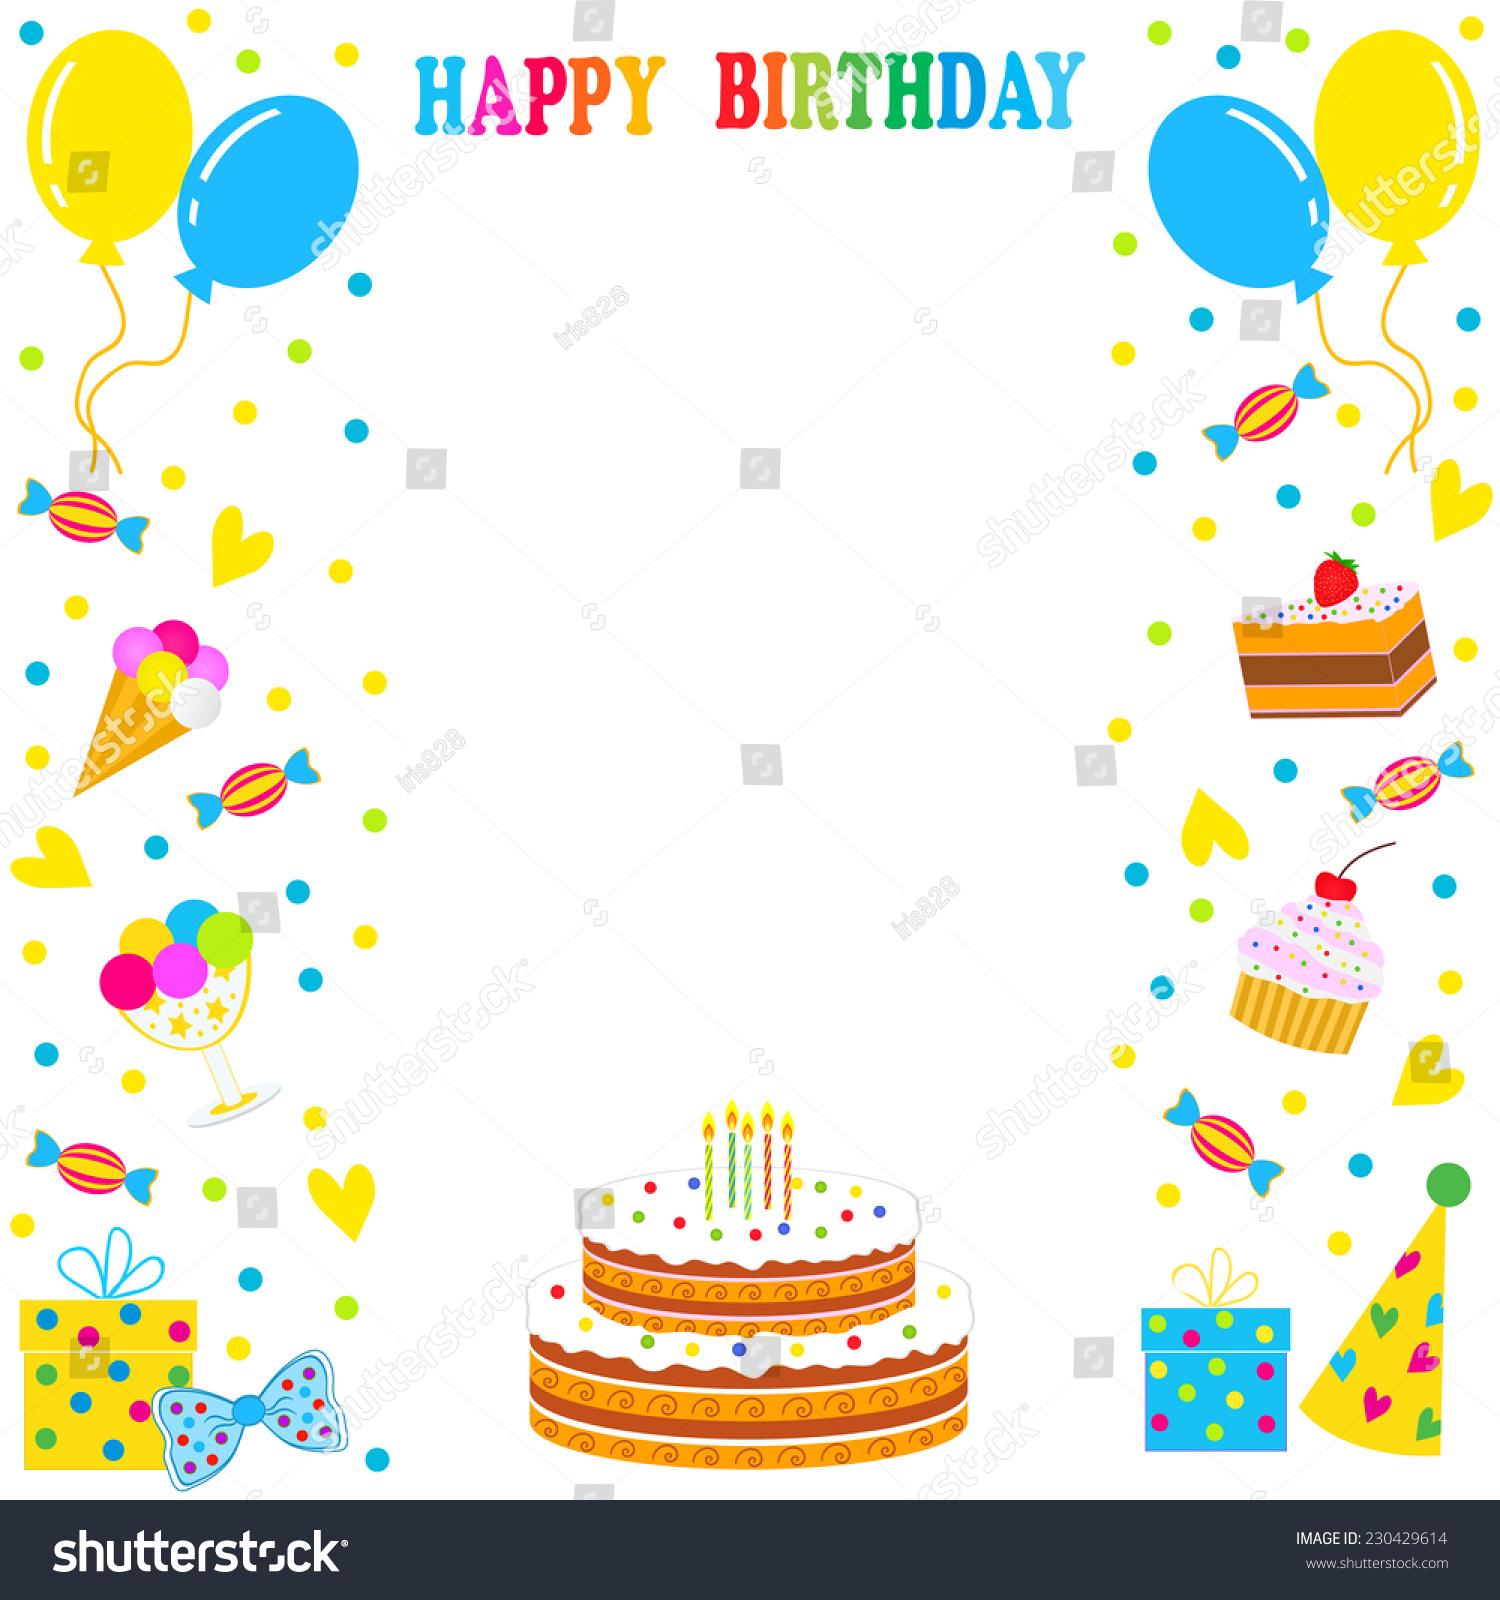 Birthday Frame Border Sweets Balloons Cake Stock Vector (2018 ...